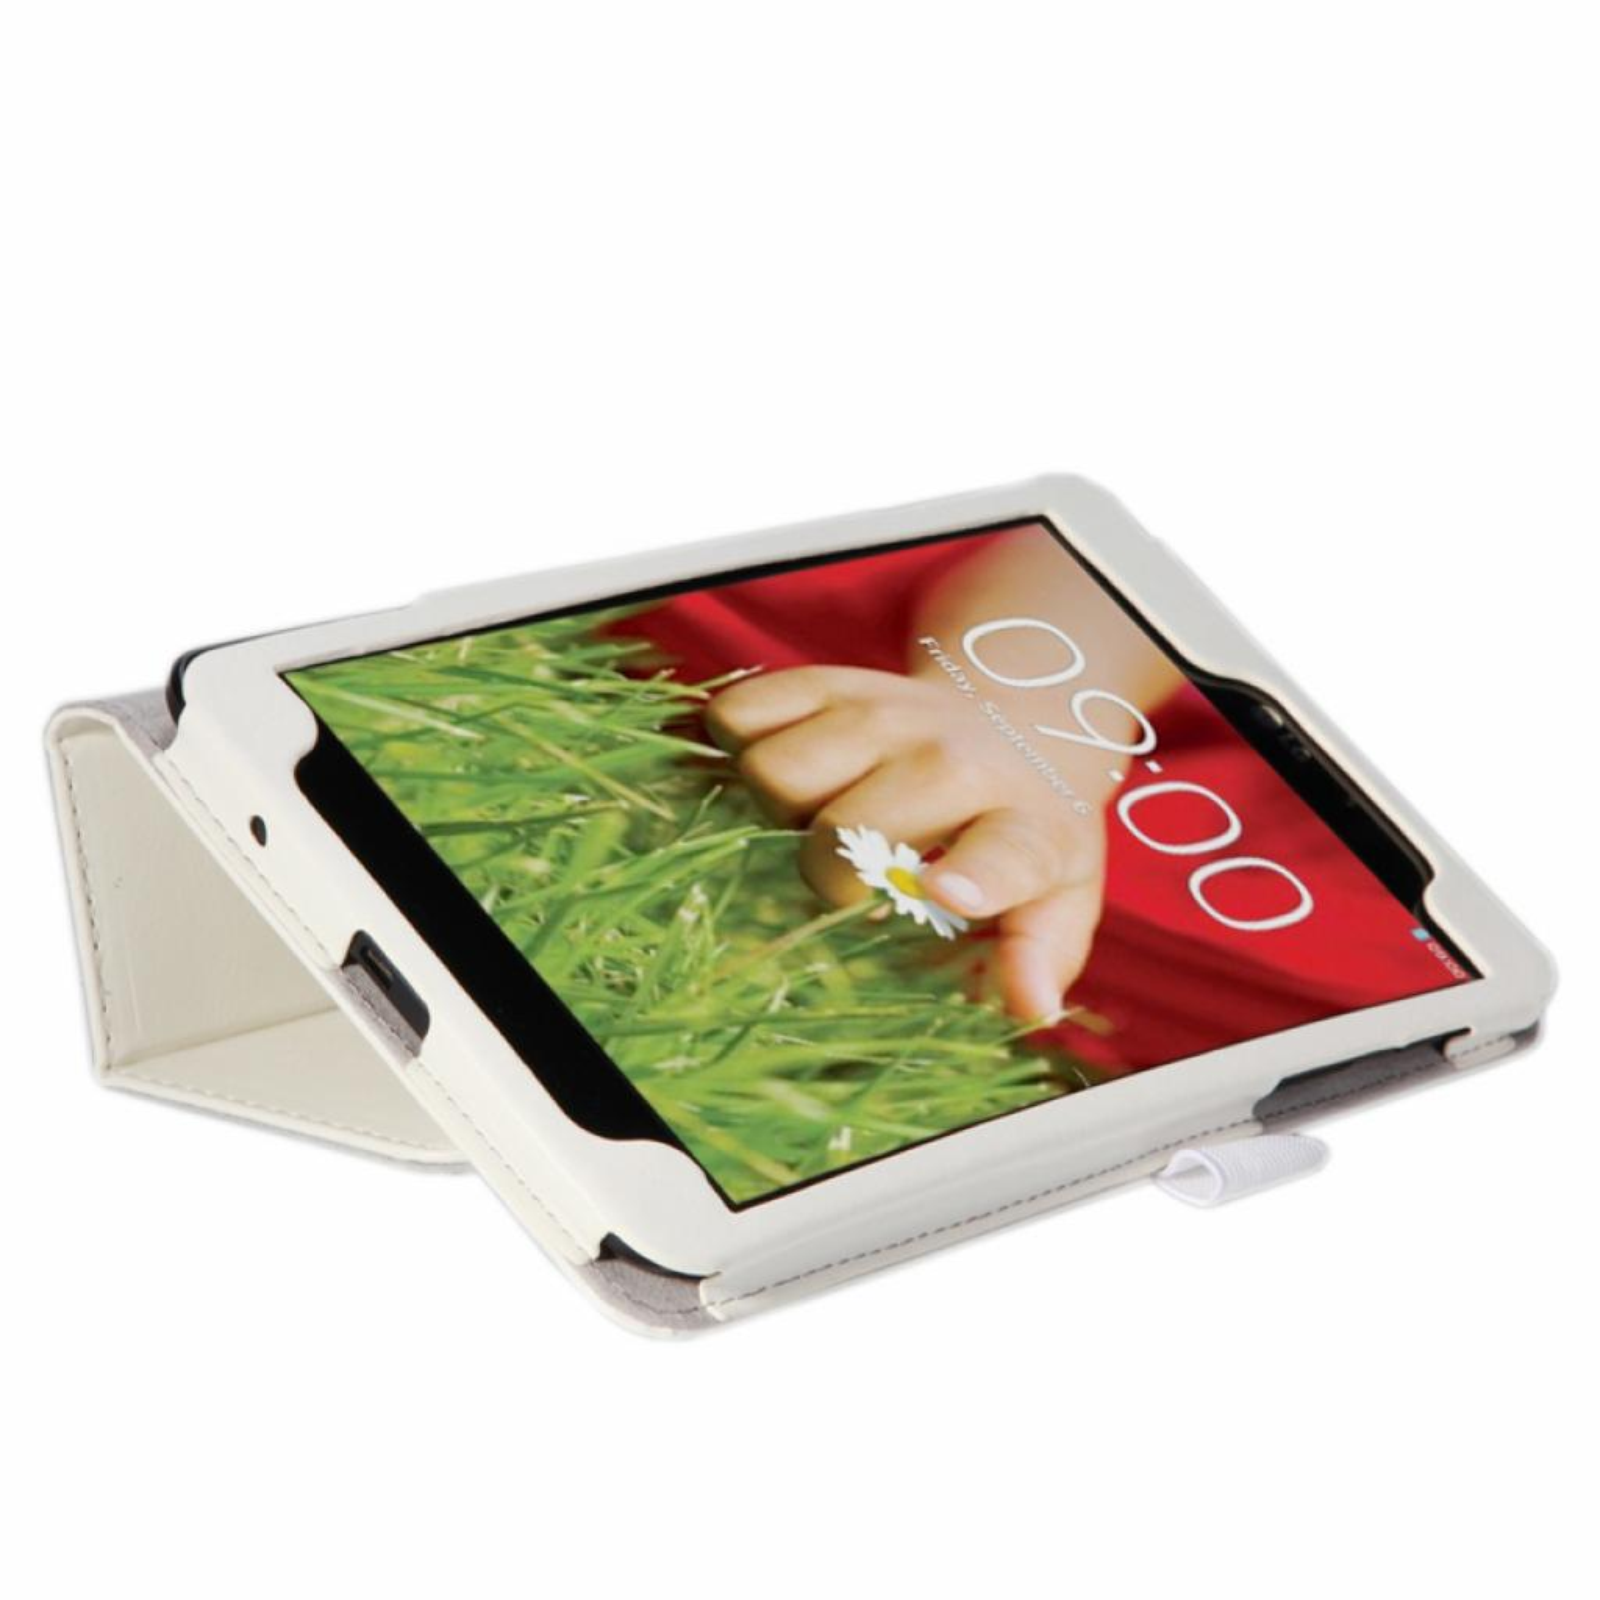 Чехол для планшета AirOn для LG G Pad 8.3 white (6946795850113) изображение 3